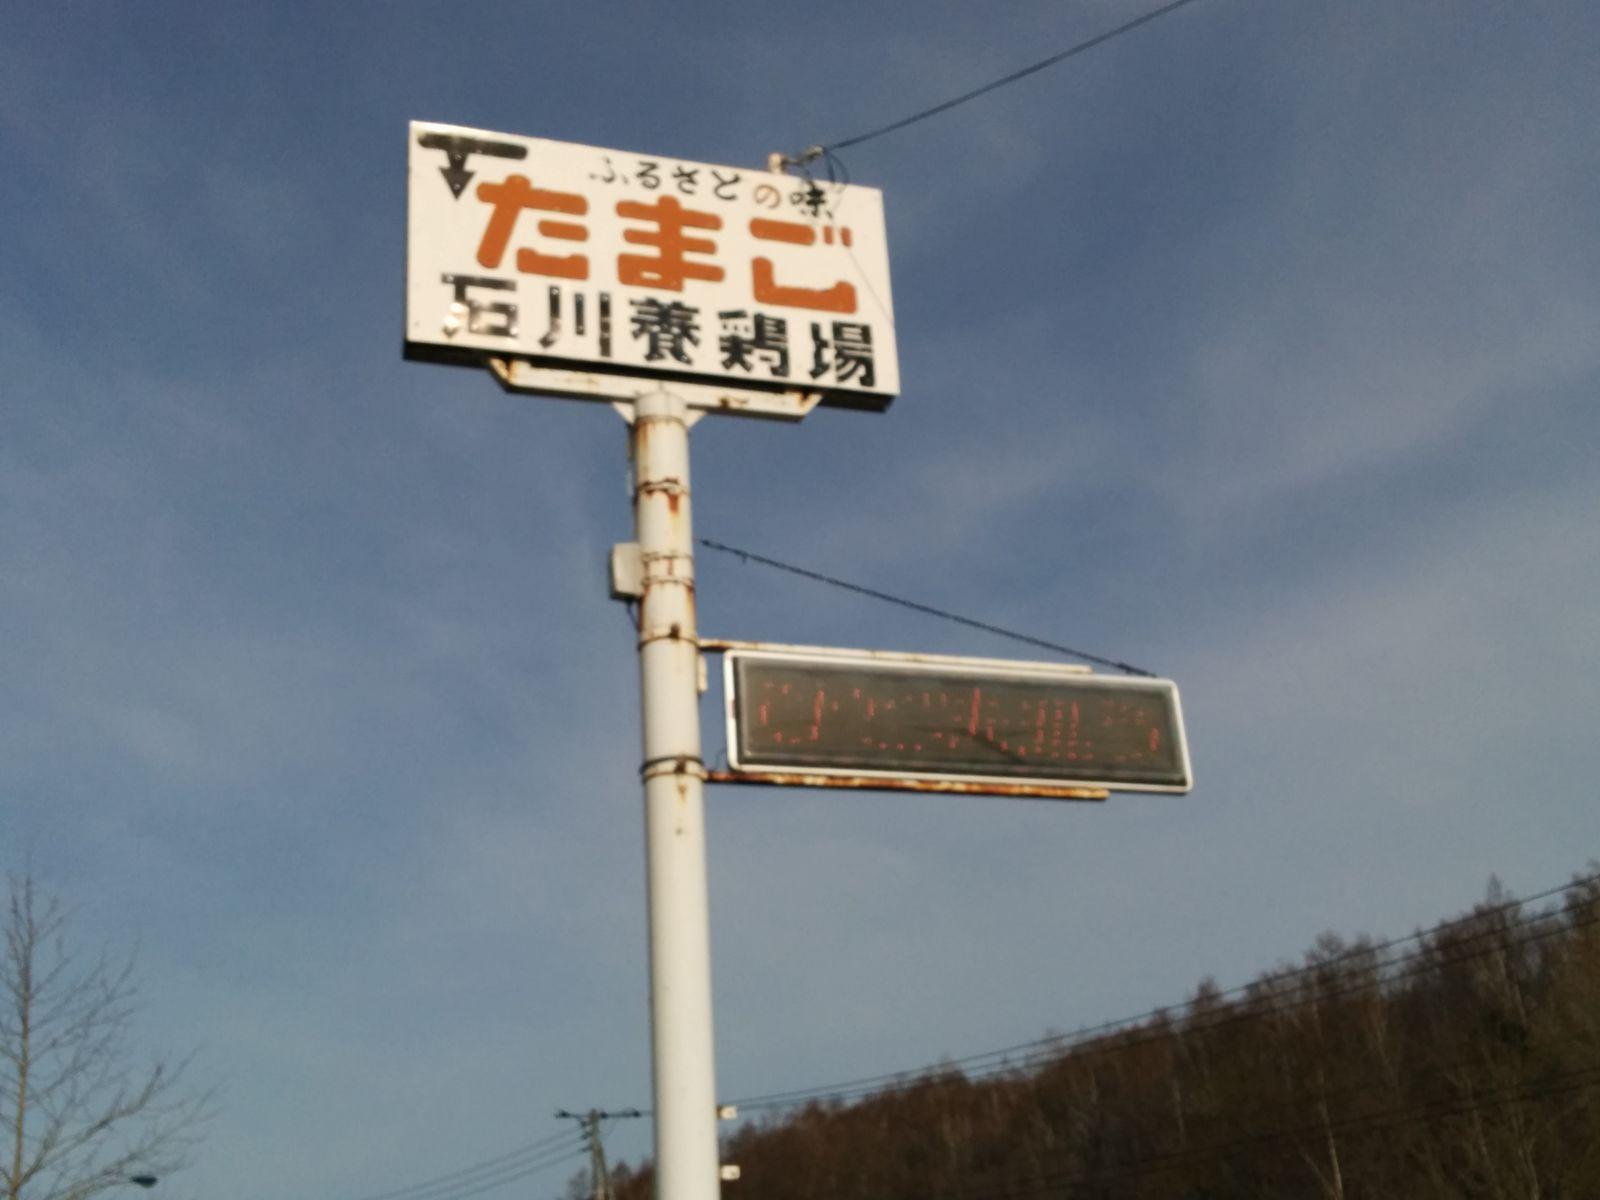 【倶知安】倶知安・石川養鶏場観光案内です。